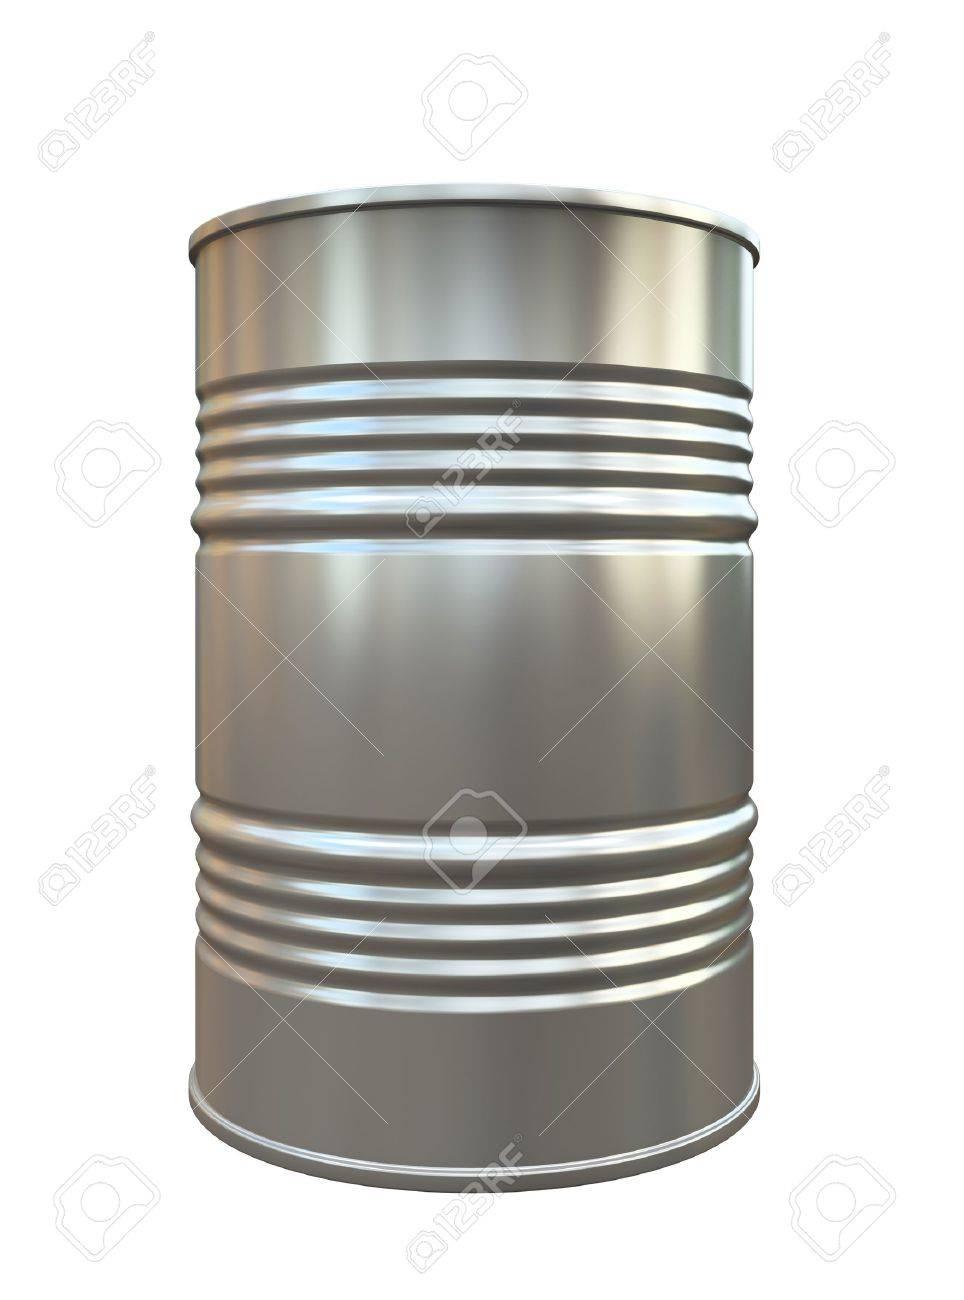 Metal barrel isolated on white background illustration Stock Illustration - 16667846